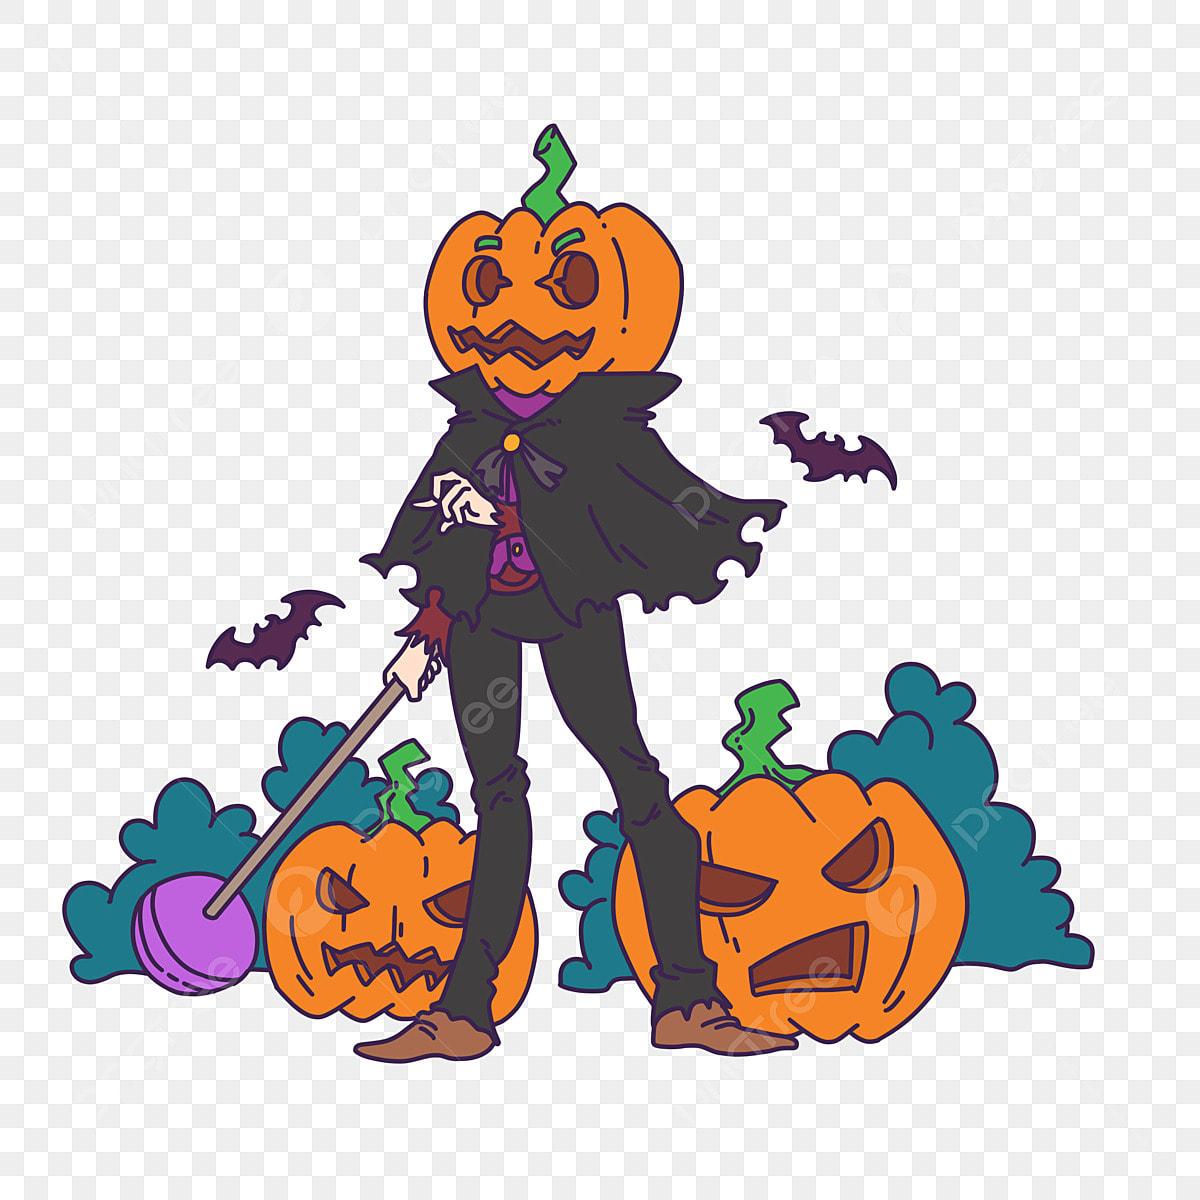 Semangat Jahat Hantu Seram Halloween Kartun Karnival